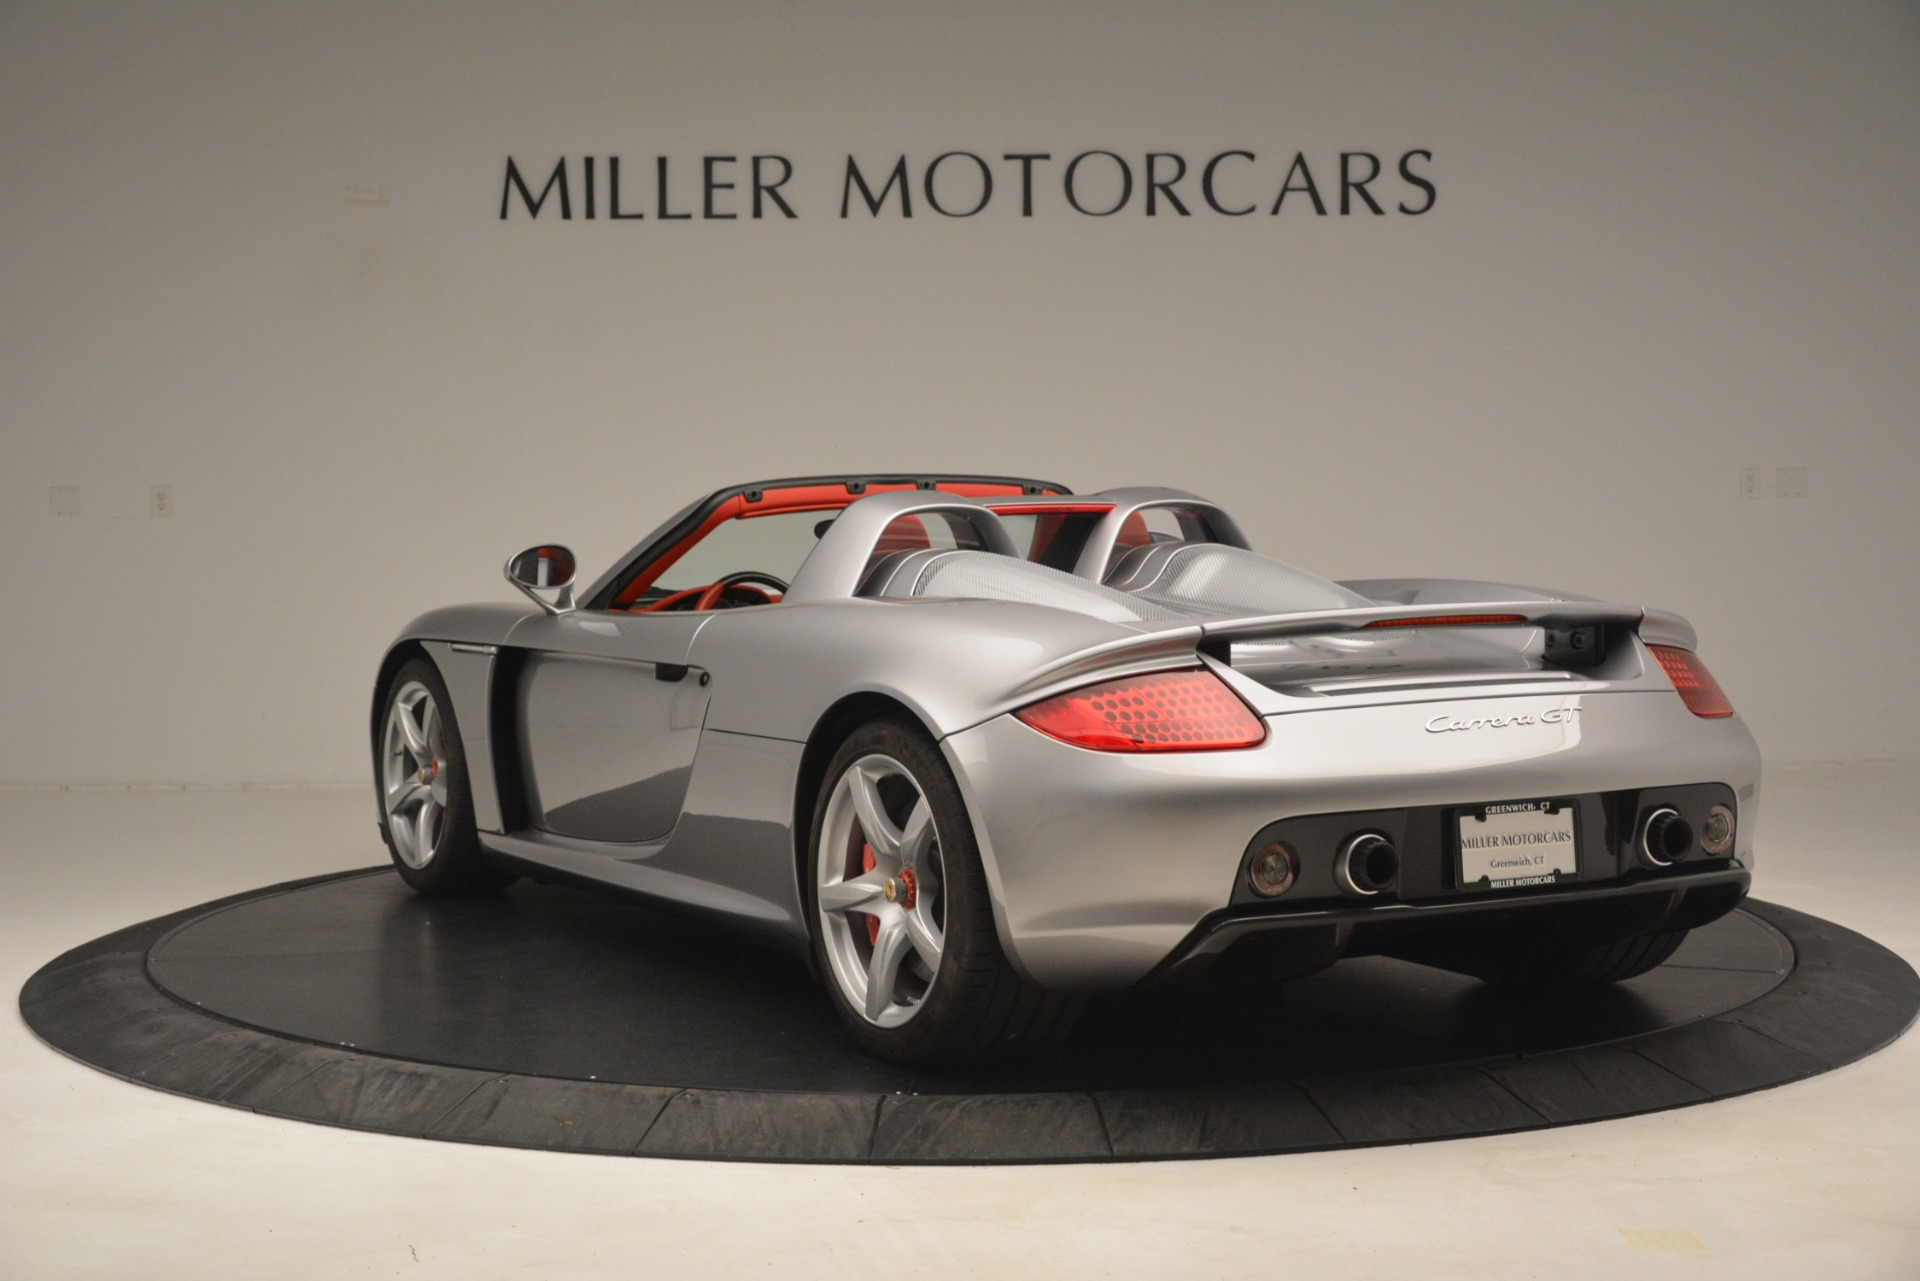 Used 2005 Porsche Carrera GT  For Sale In Greenwich, CT 3161_p5